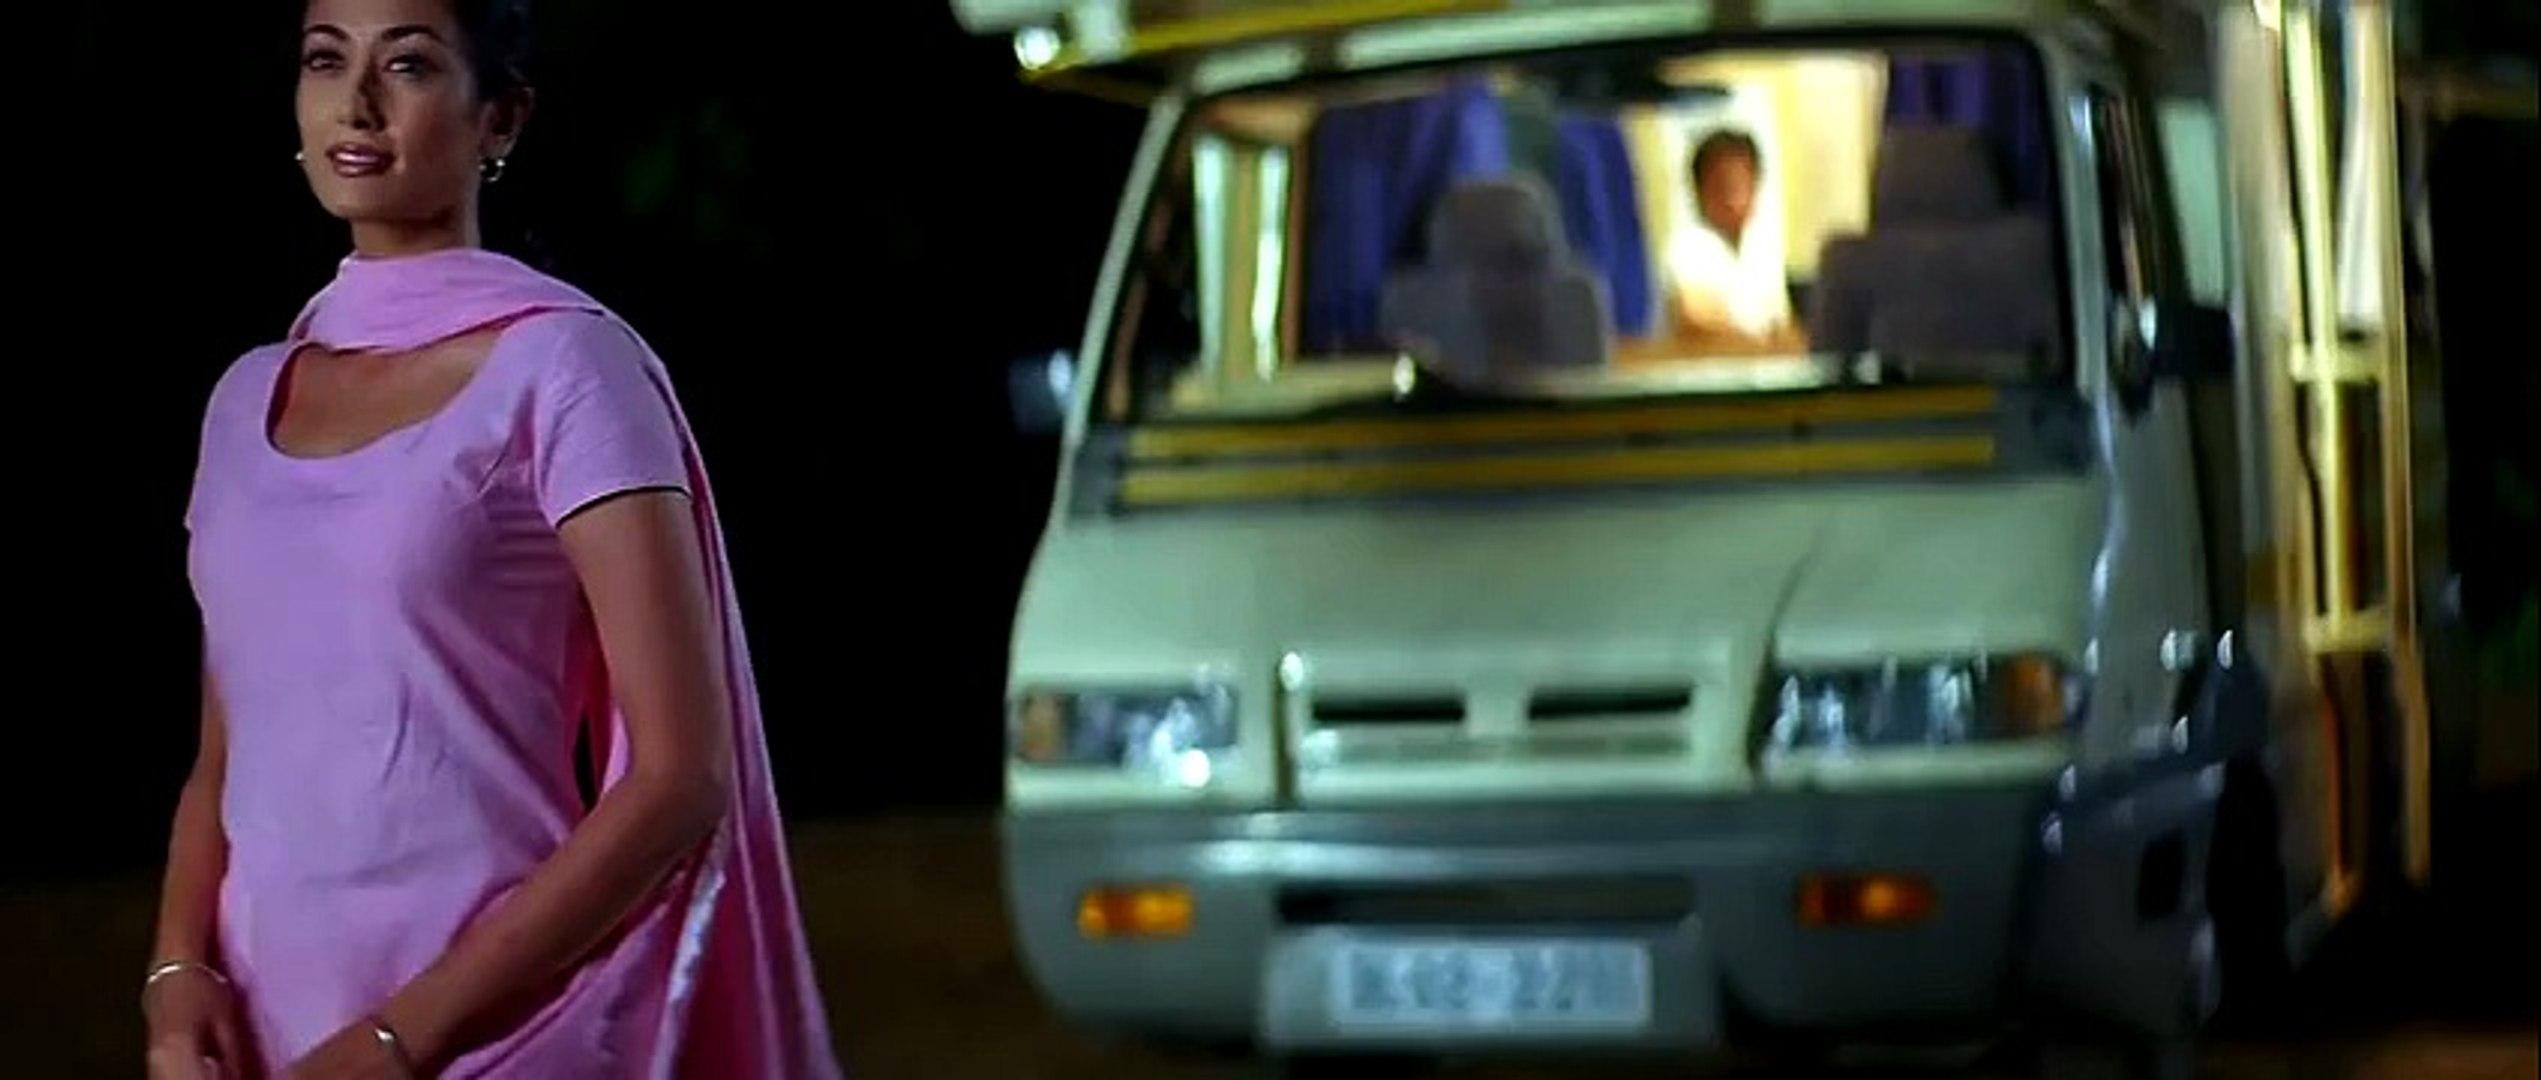 Dekho Na Full Video Song Hd With Lyrics Swades Video Dailymotion